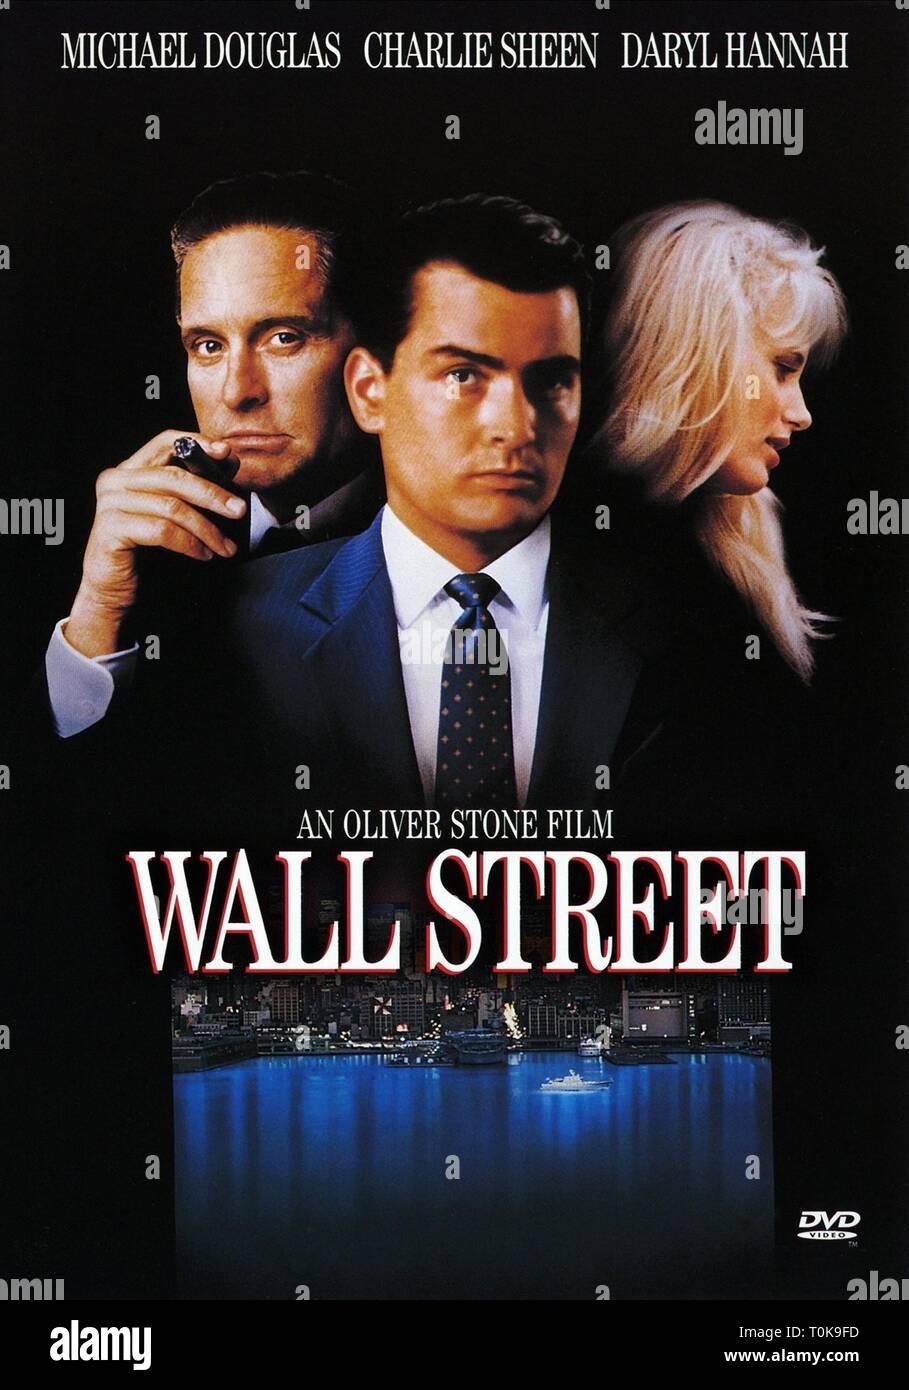 MOVIE POSTER, WALL STREET, 1987 Stock Photo - Alamy